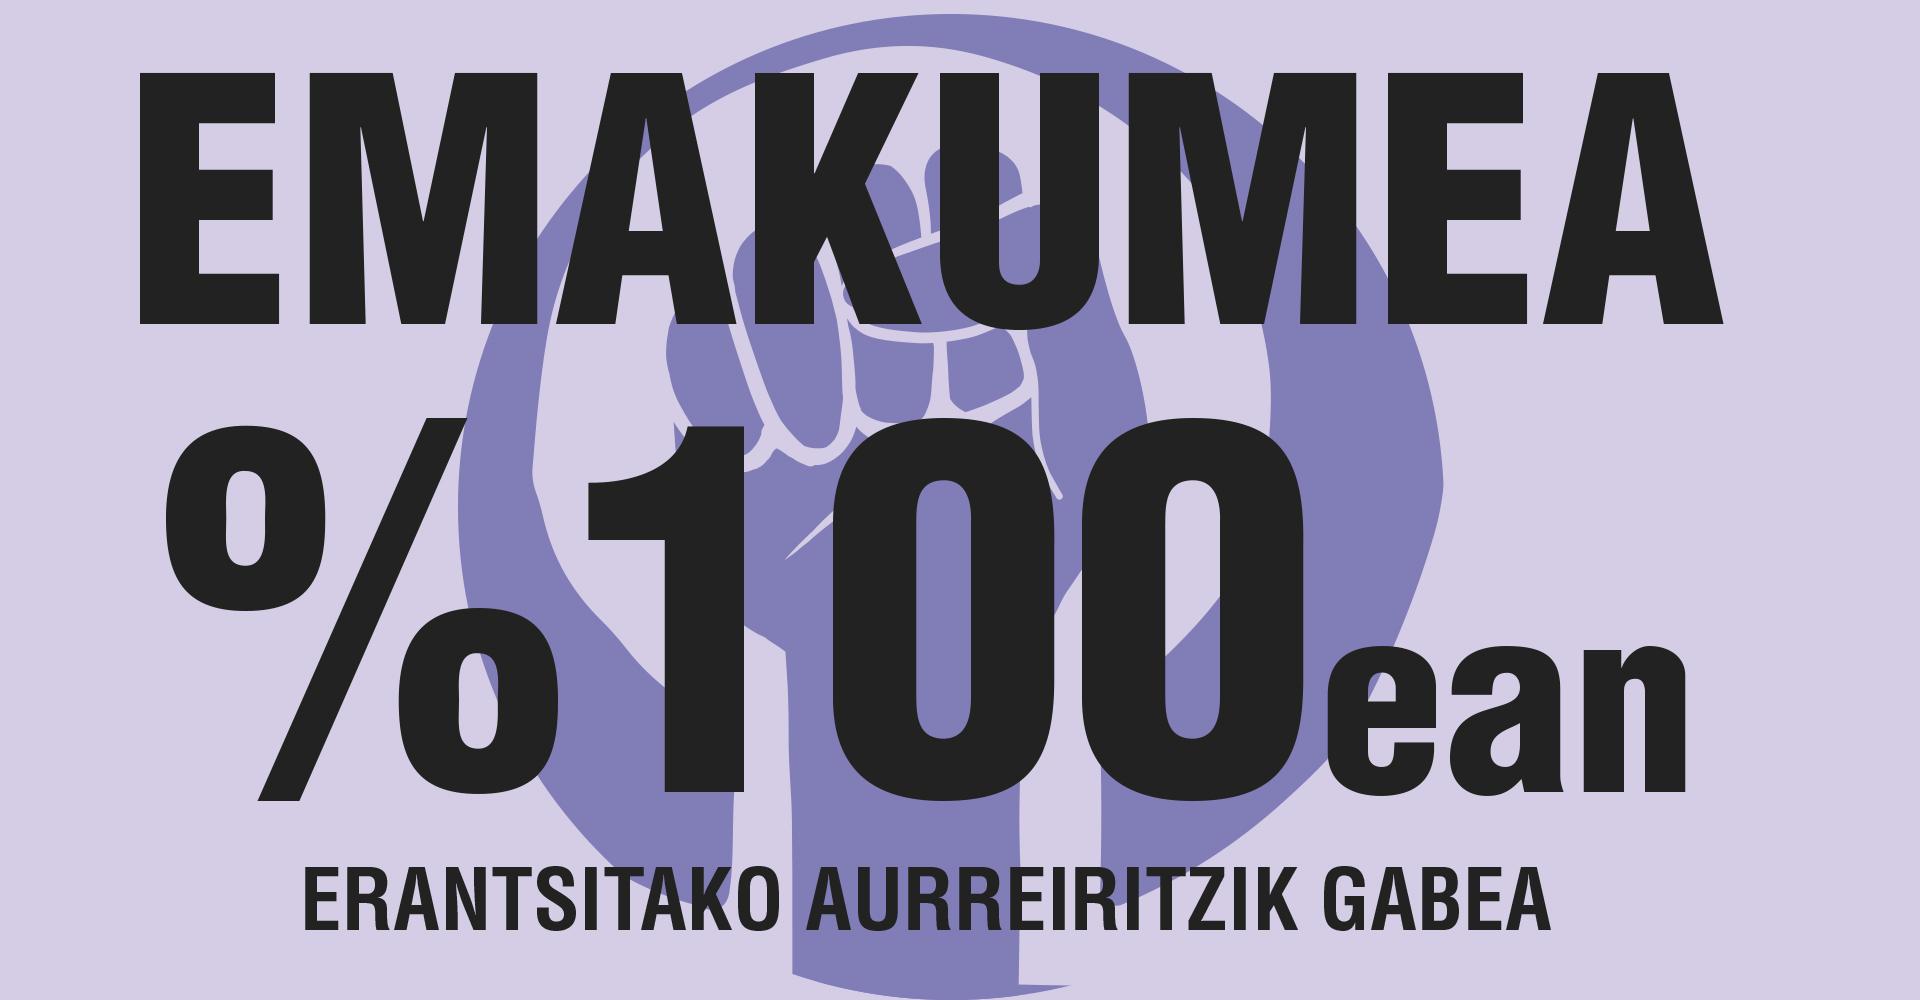 EMAKUMEA %100EAN